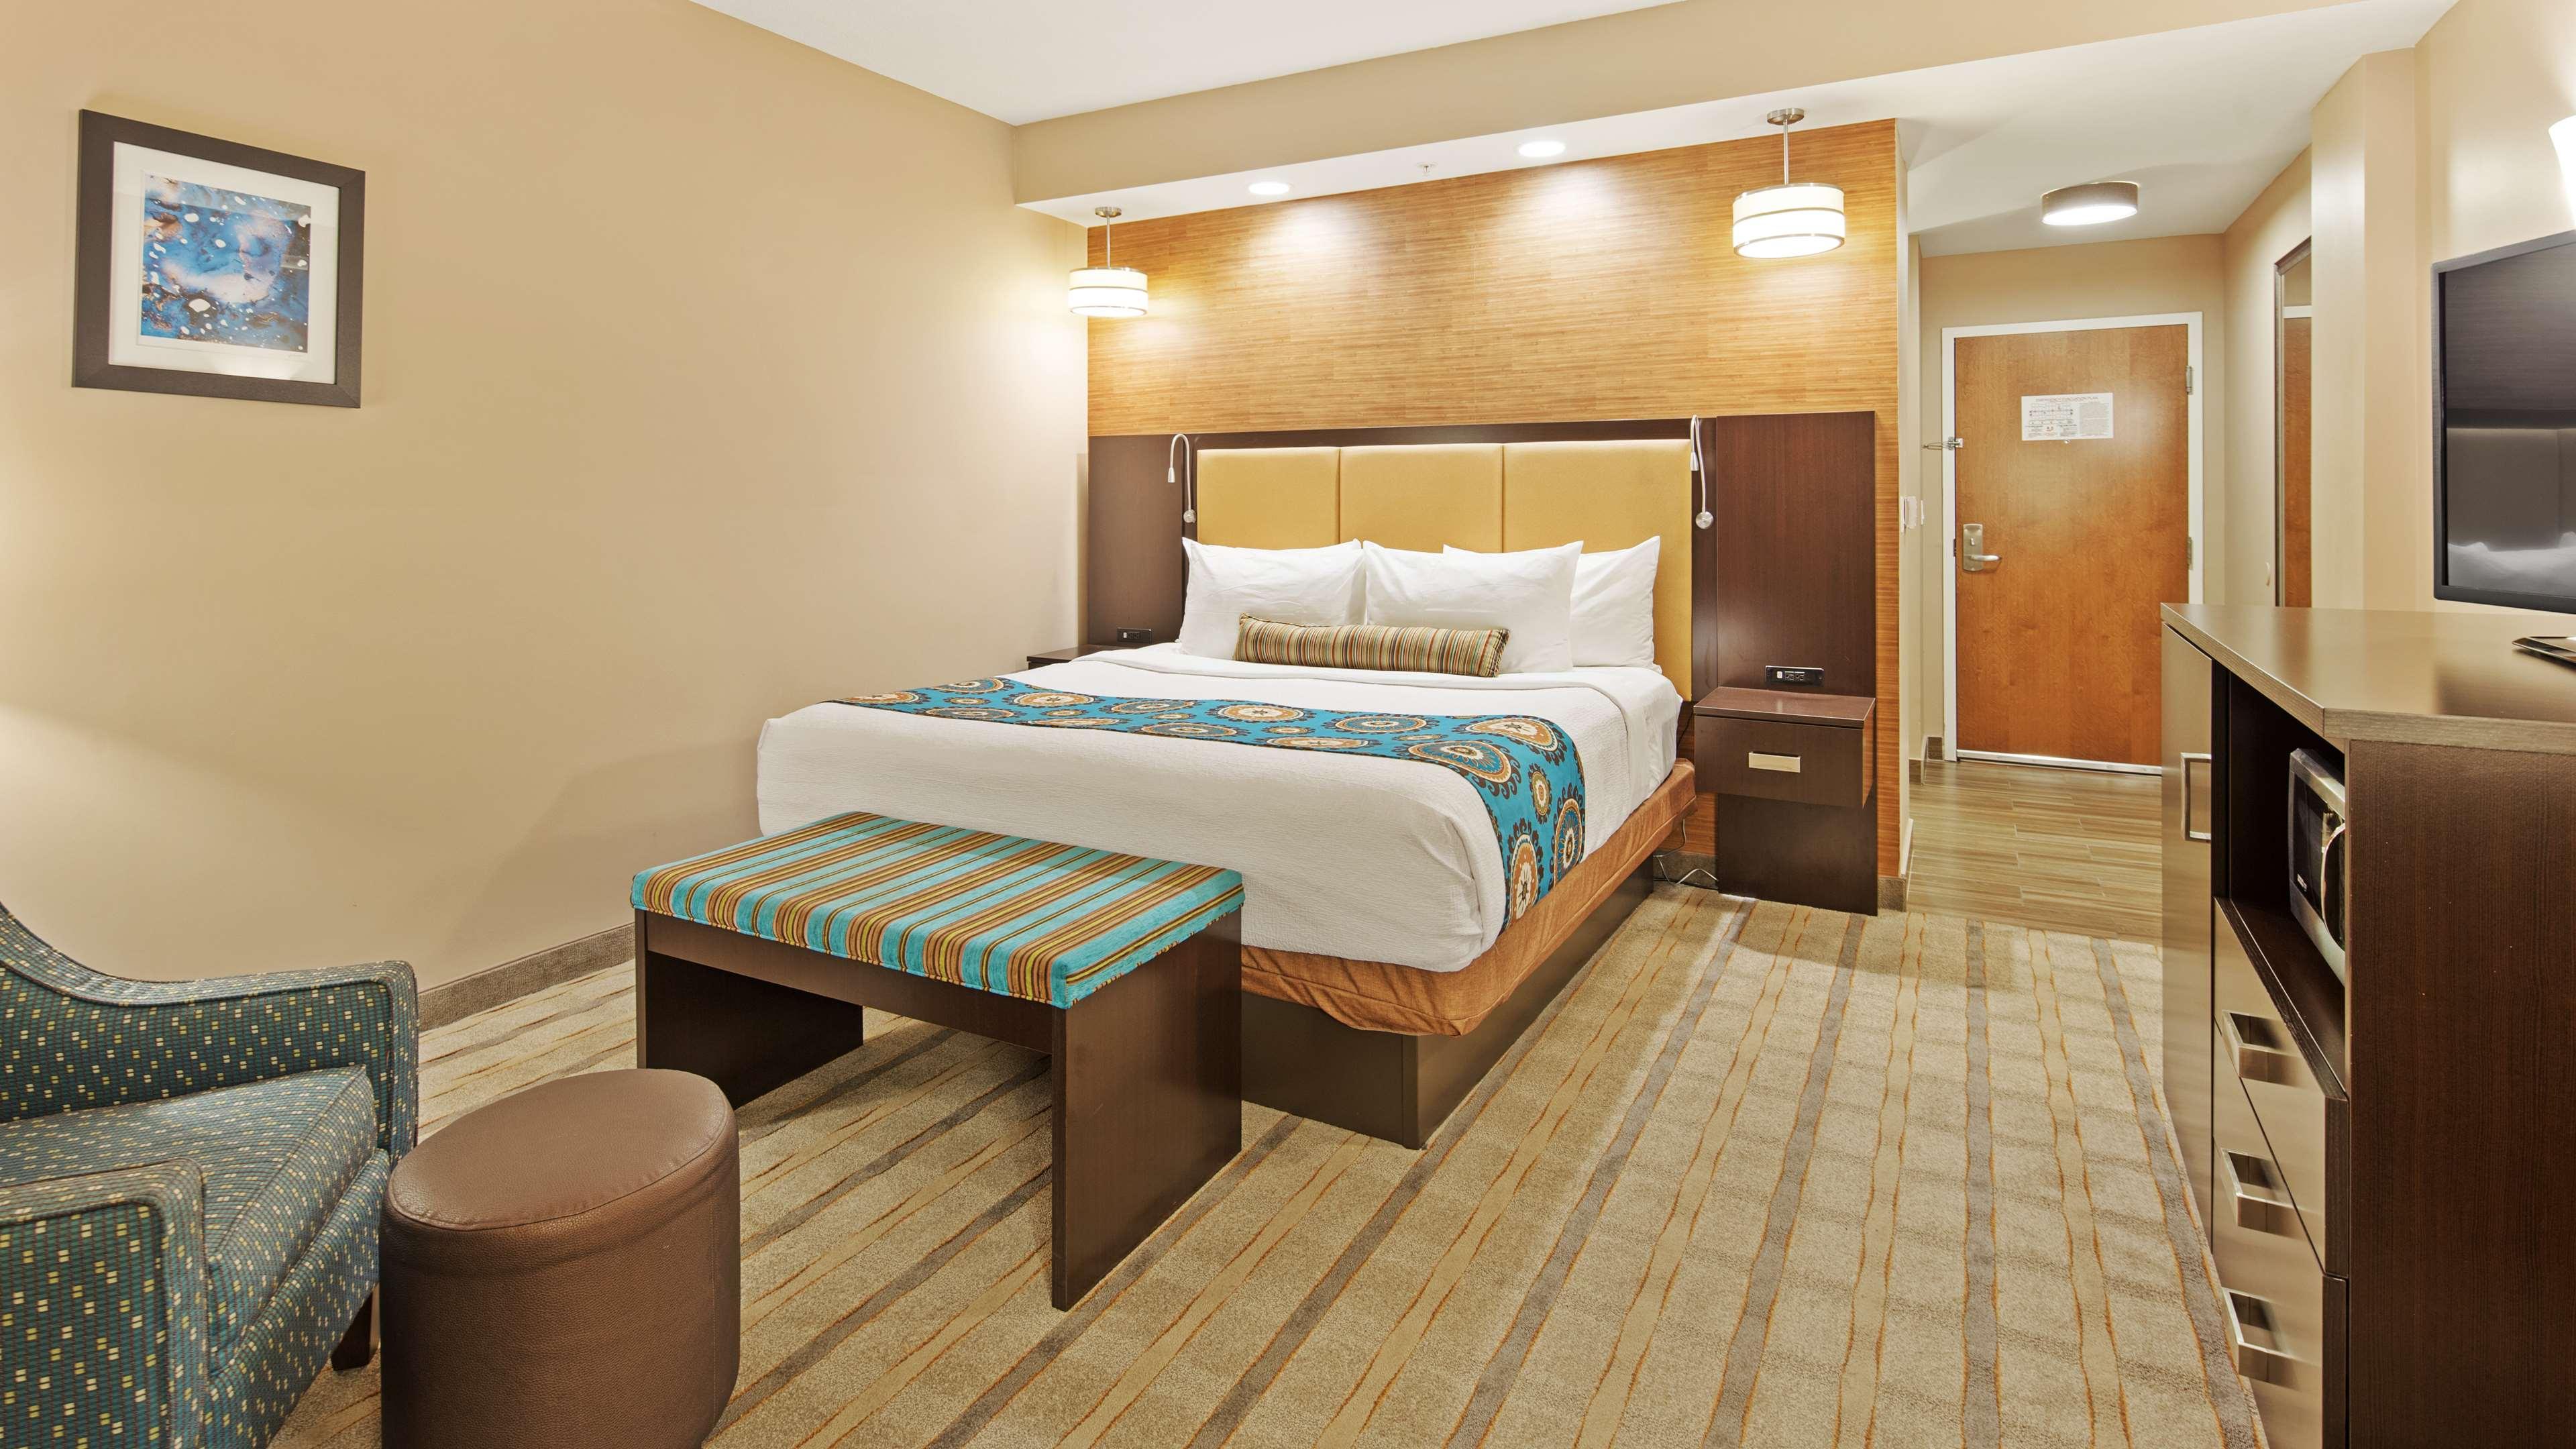 Best Western Plus Kendall Airport Hotel & Suites image 15